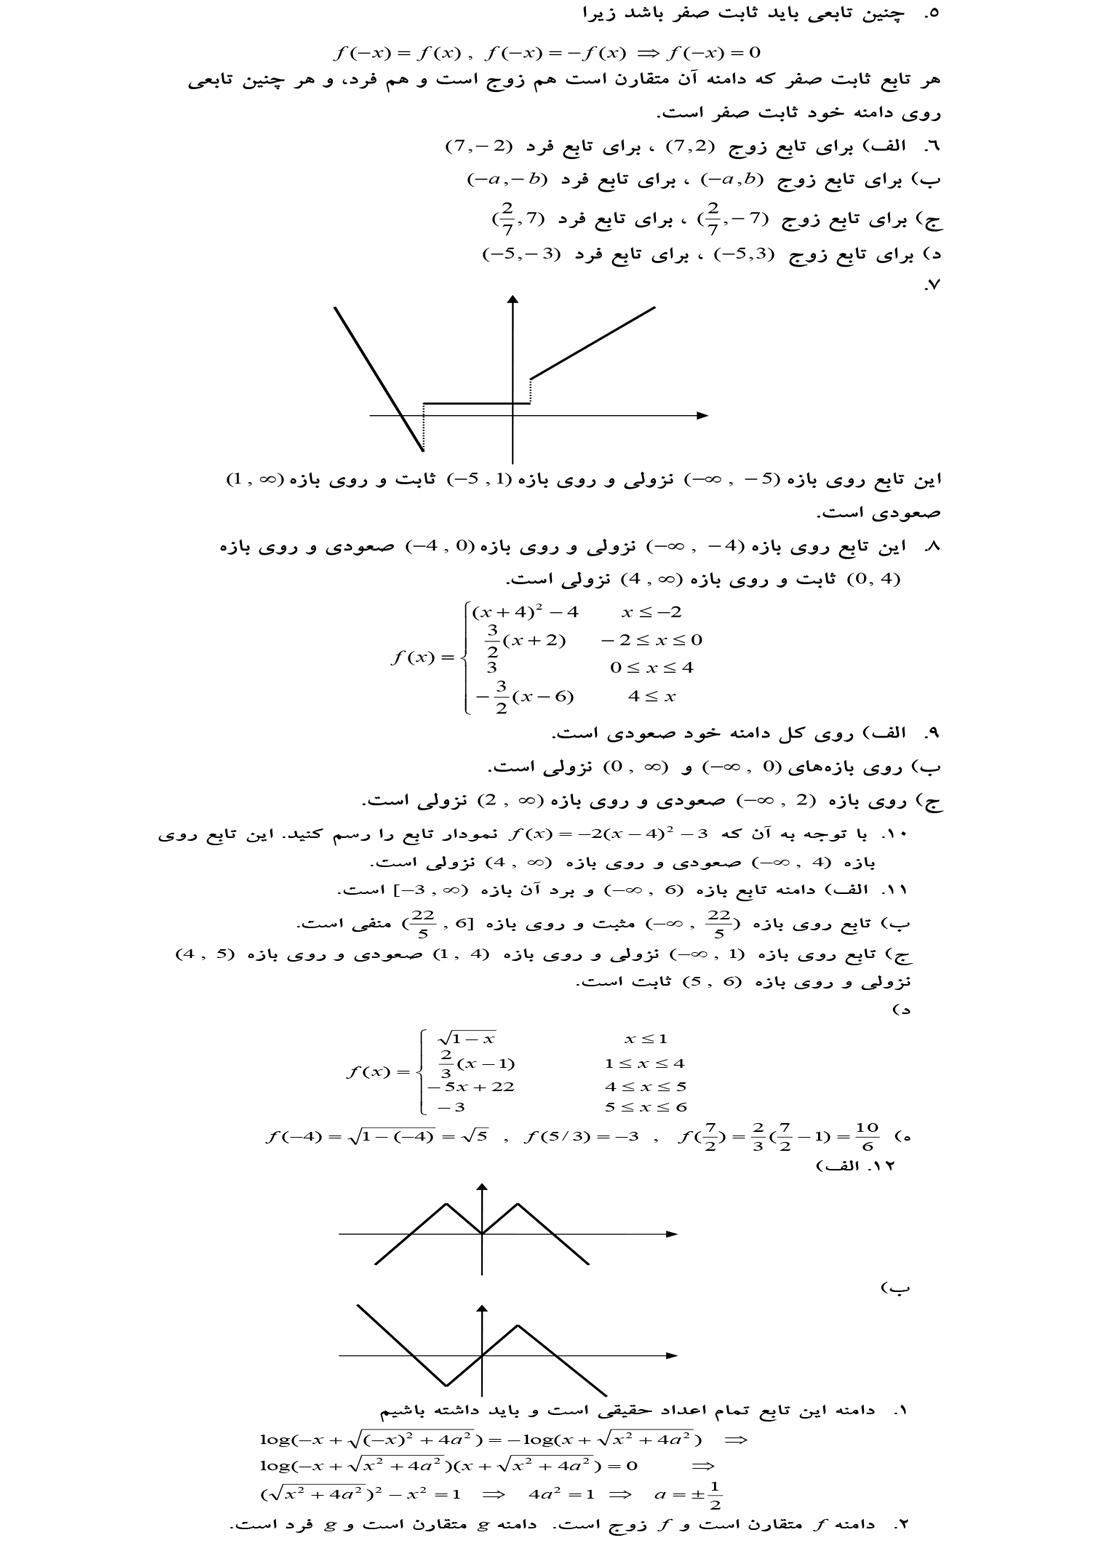 ادامه حل مسائل صفحه 84 فصل دوم حسابان سال سوم